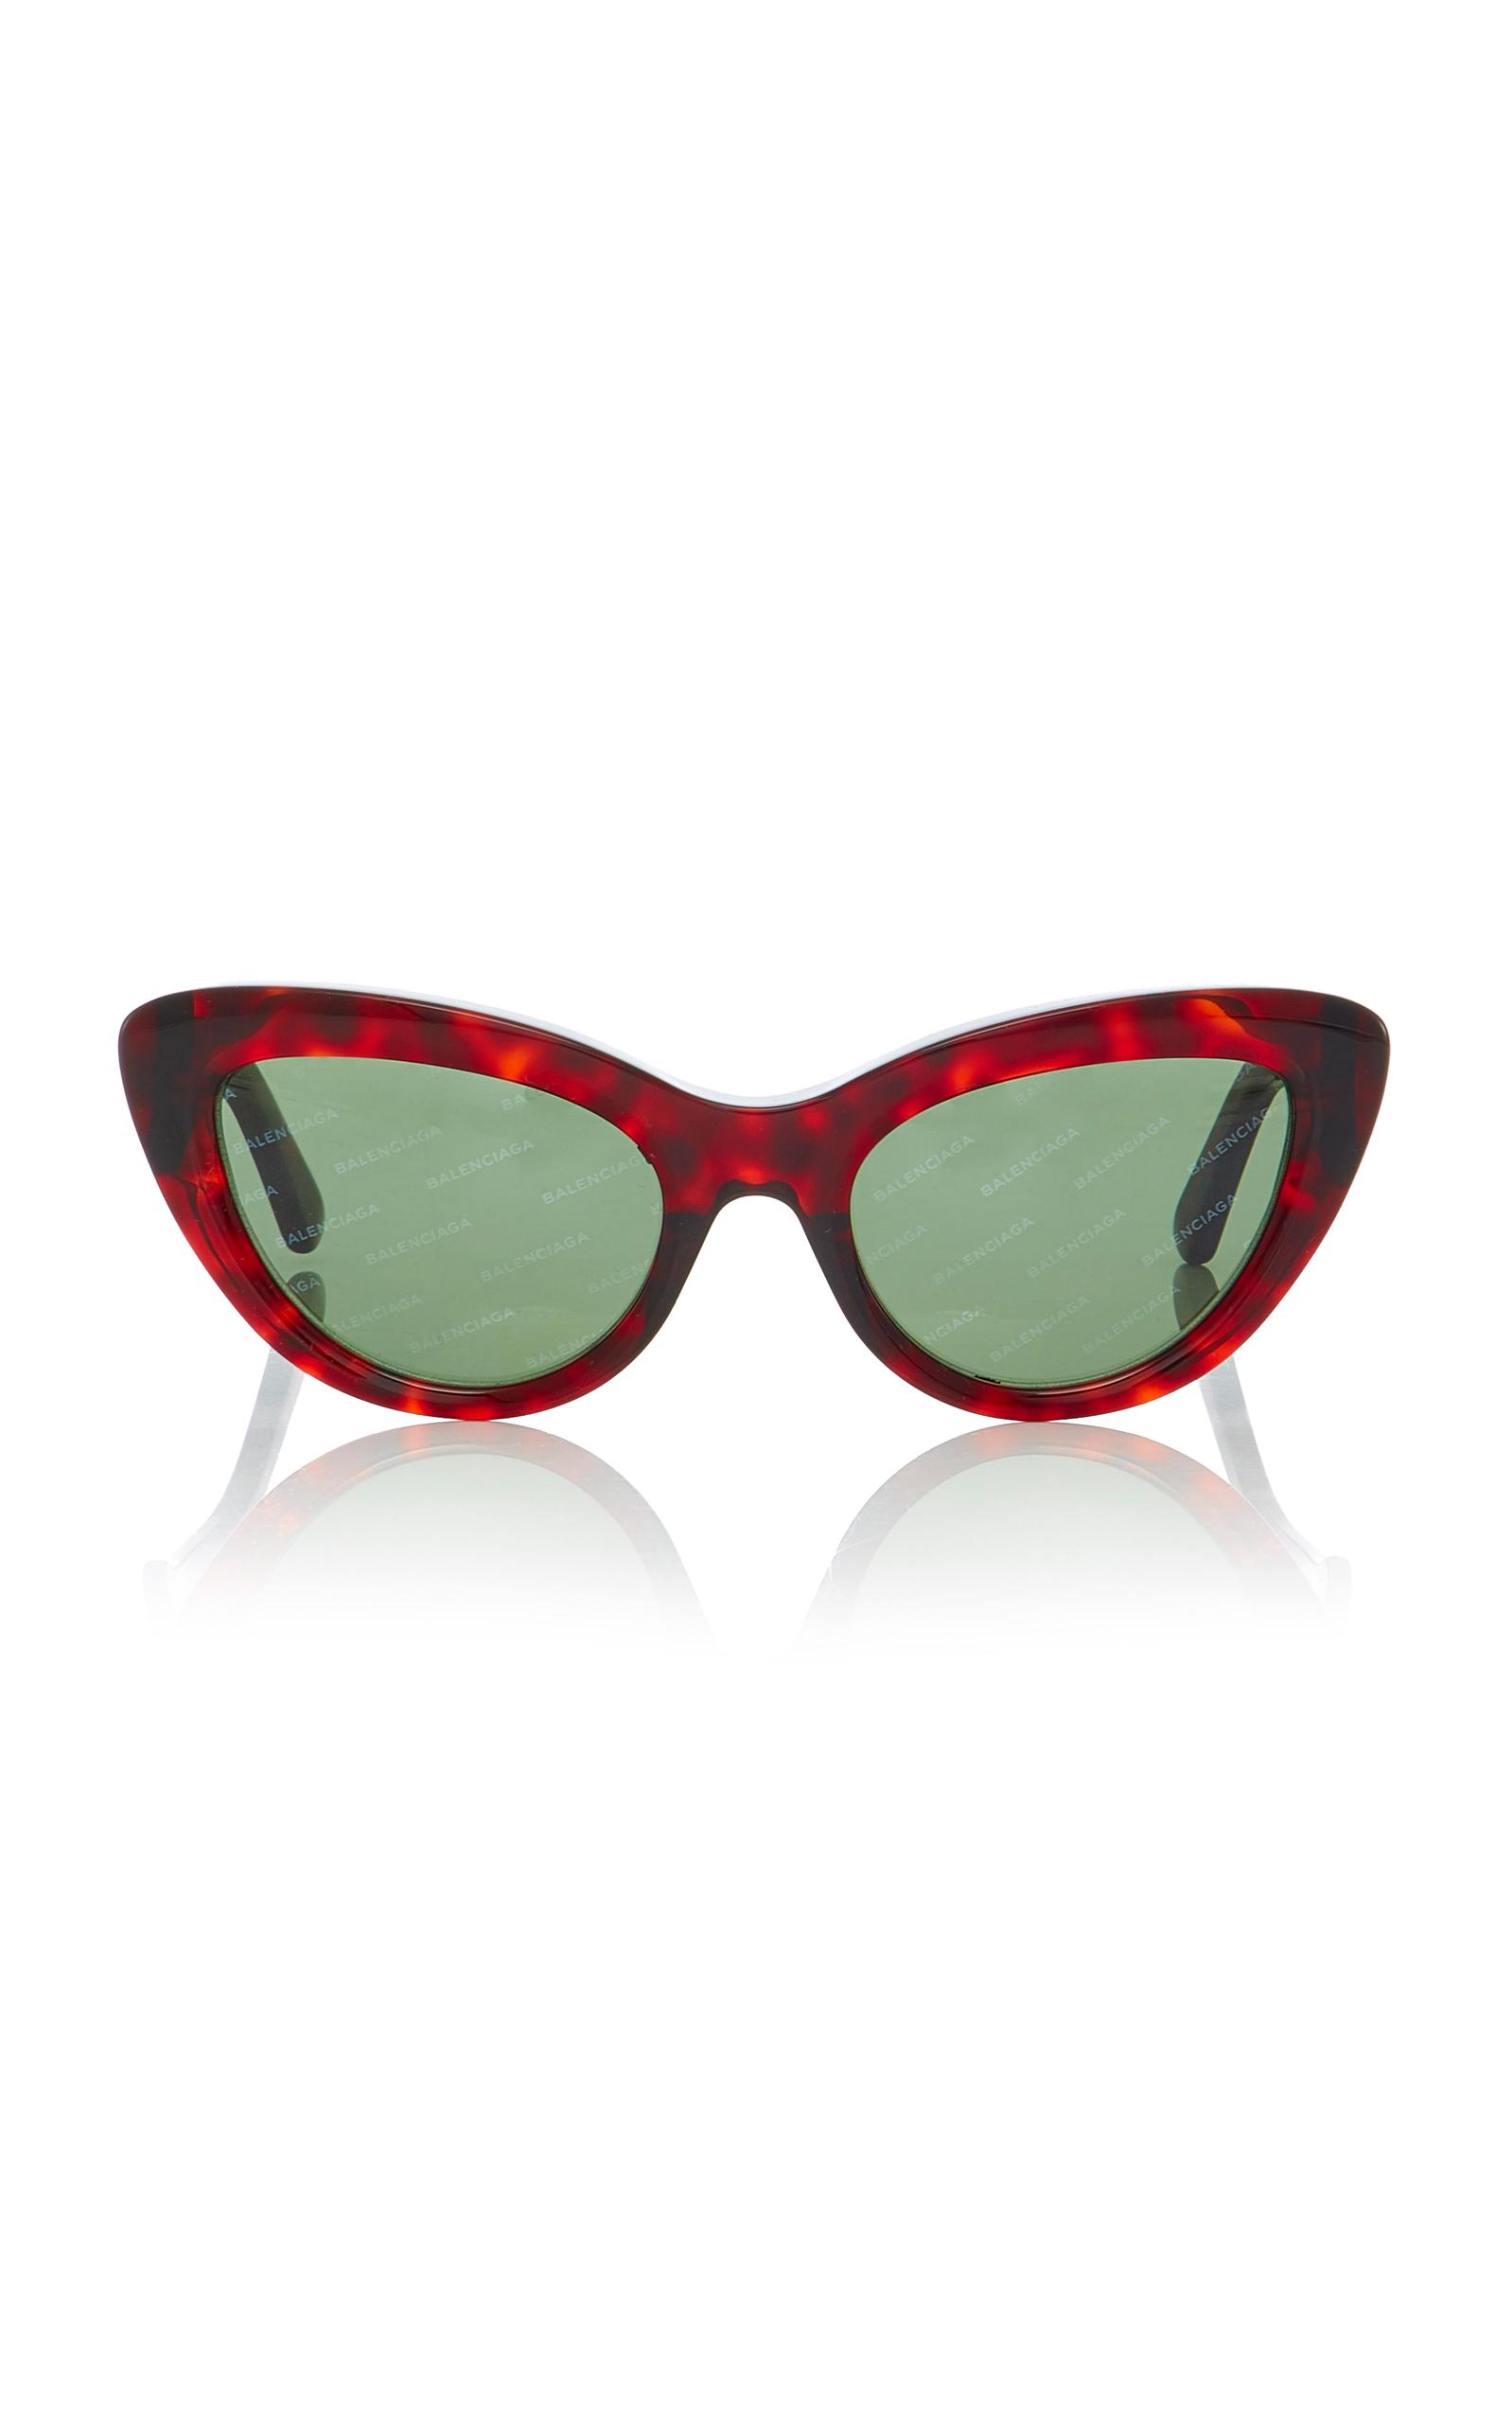 e0933399c7c Tortoiseshell Acetate Sunglasses by Balenciaga Sunglasses